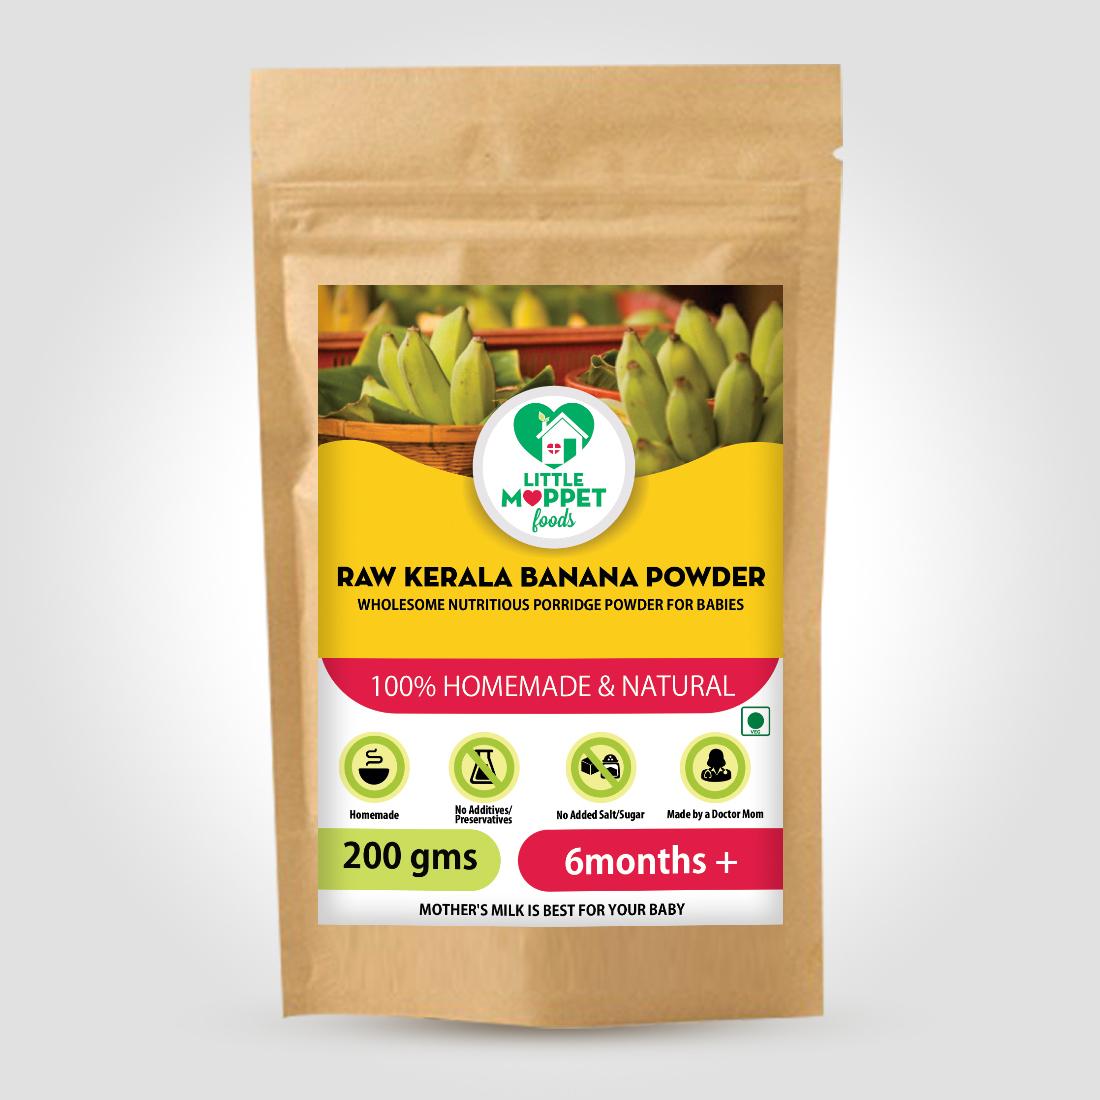 Raw Kerala Banana Powder